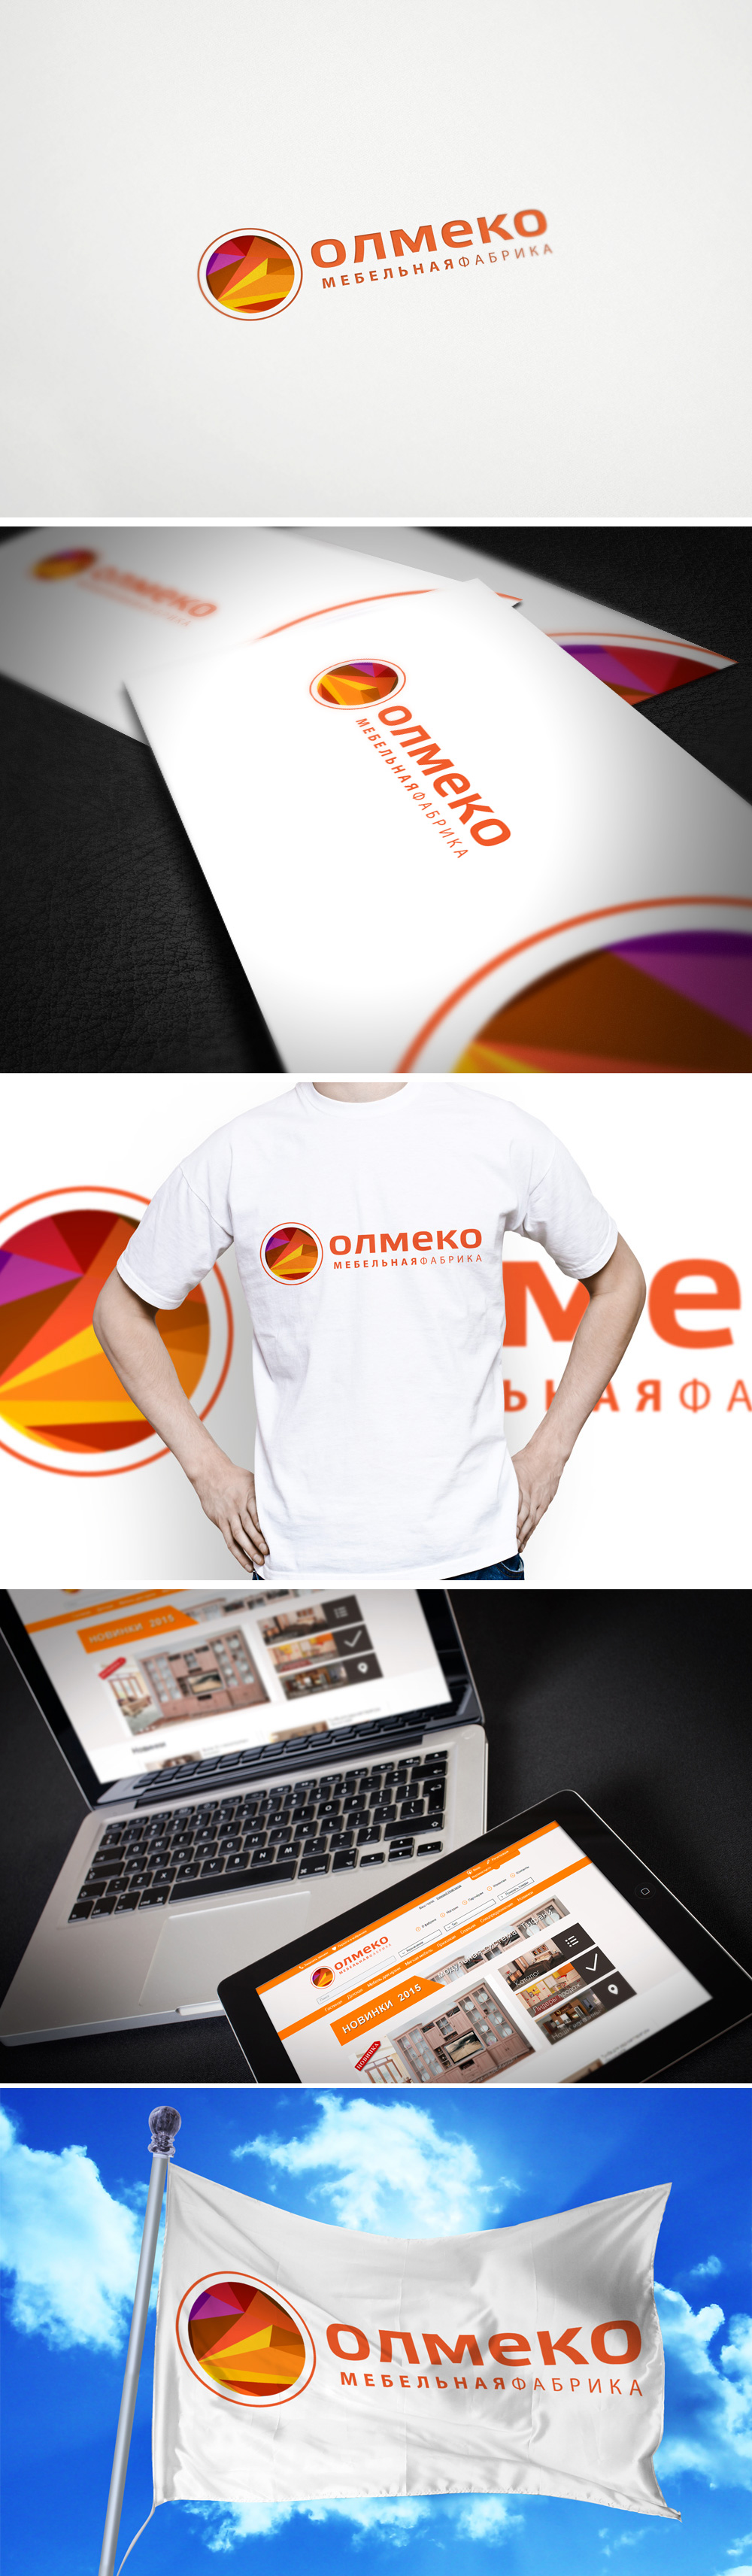 Ребрендинг/Редизайн логотипа Мебельной Фабрики фото f_29855118e795f071.jpg